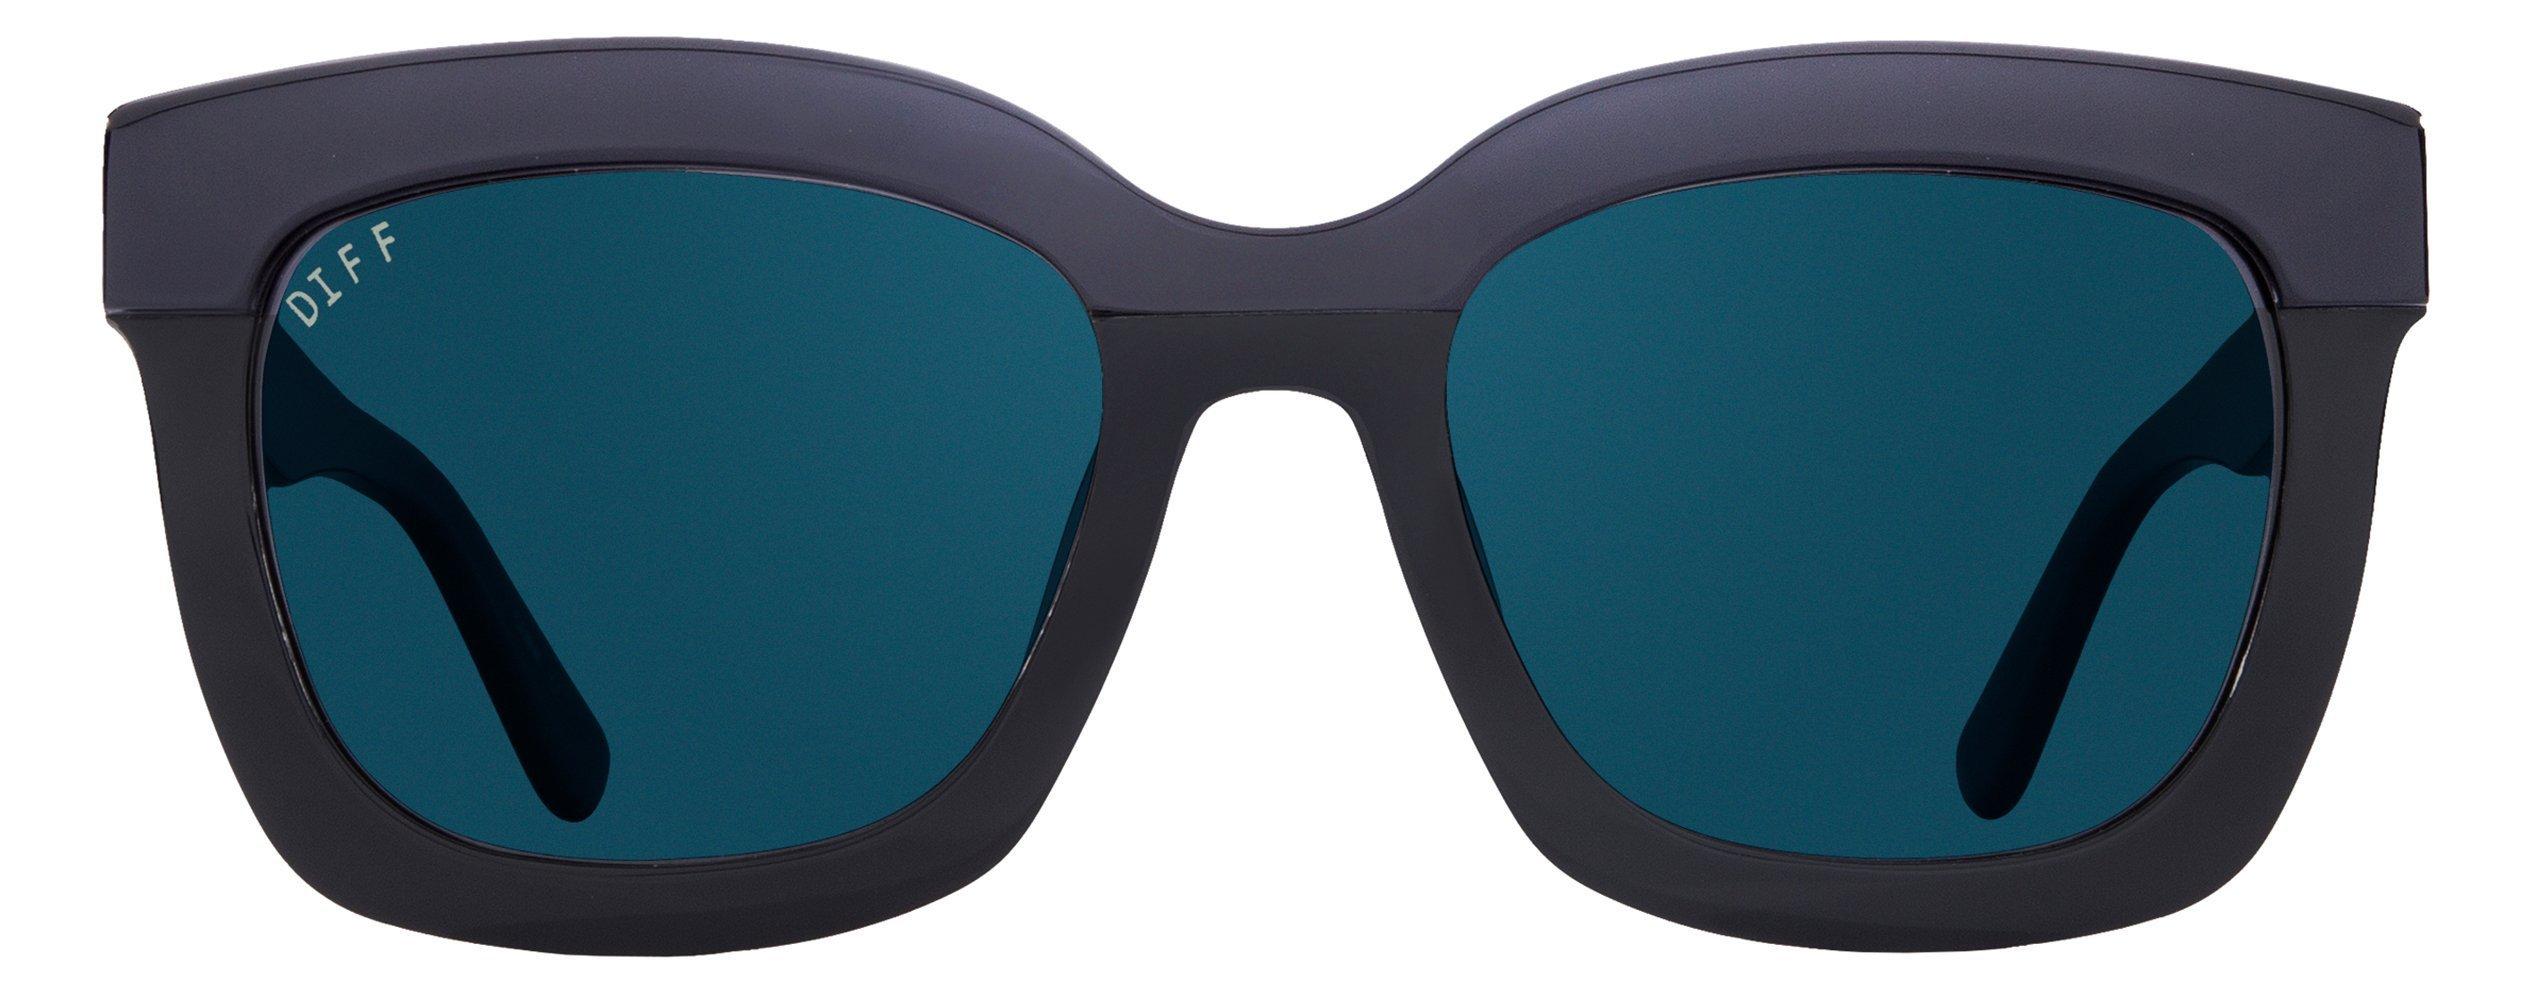 e35a5286914 Details about Diff Eyewear  Carson - Designer Square Sunglasses - 100% UVA  UVB